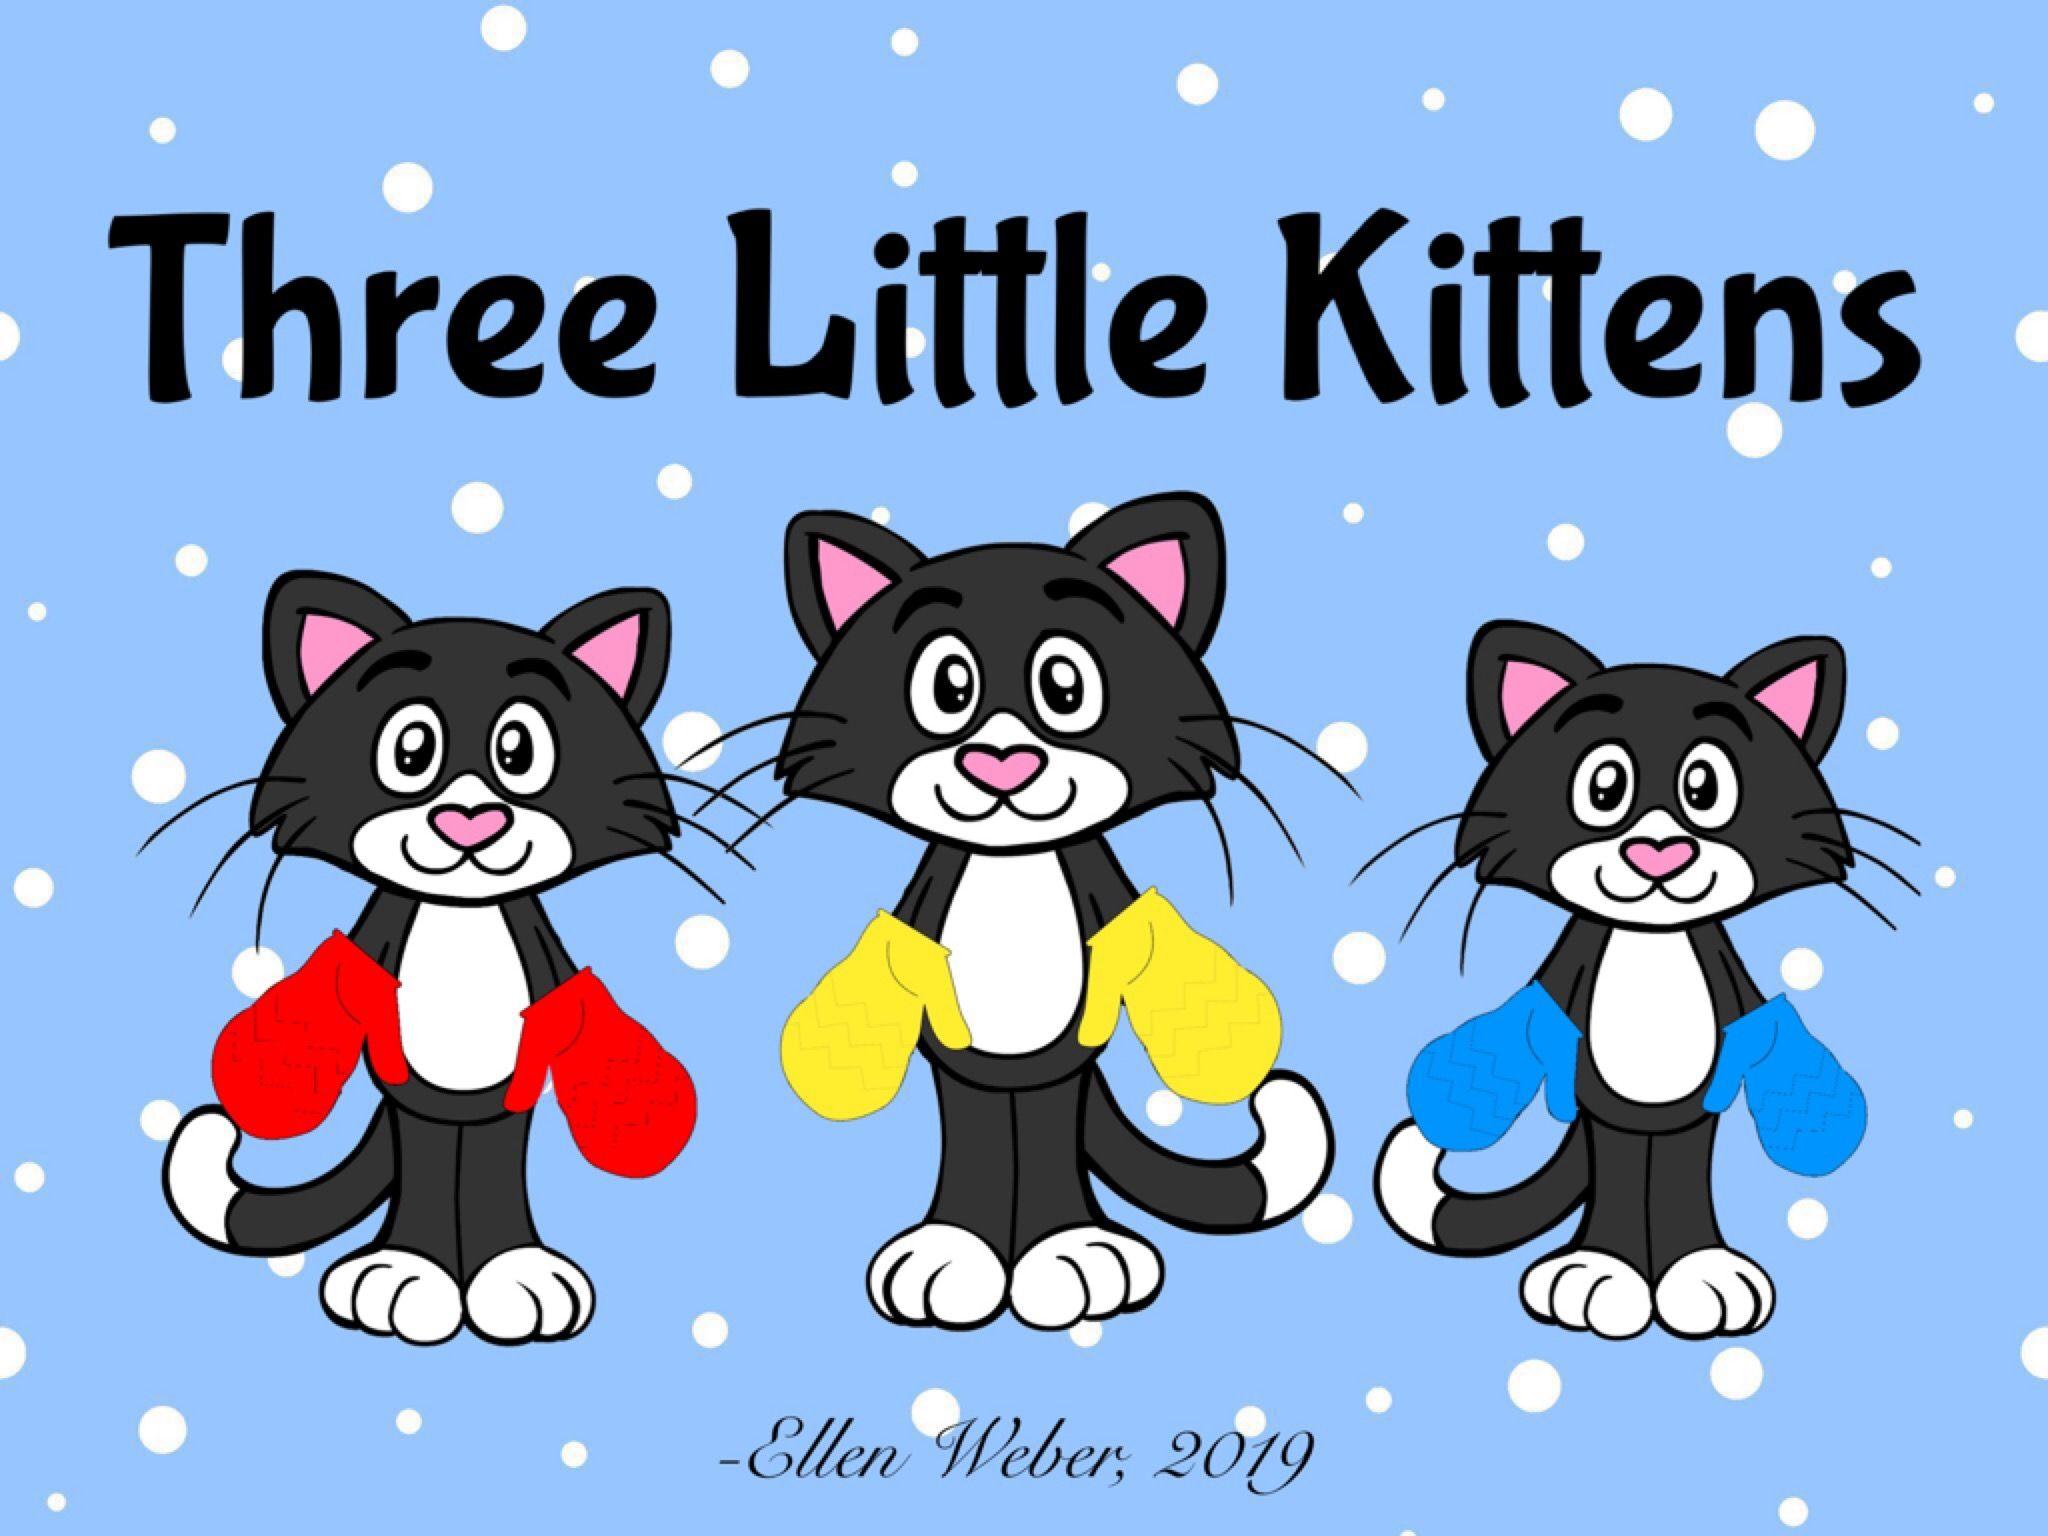 Three Little Kittens Classic Nursery Rhymes Little Kittens Animated Cartoons